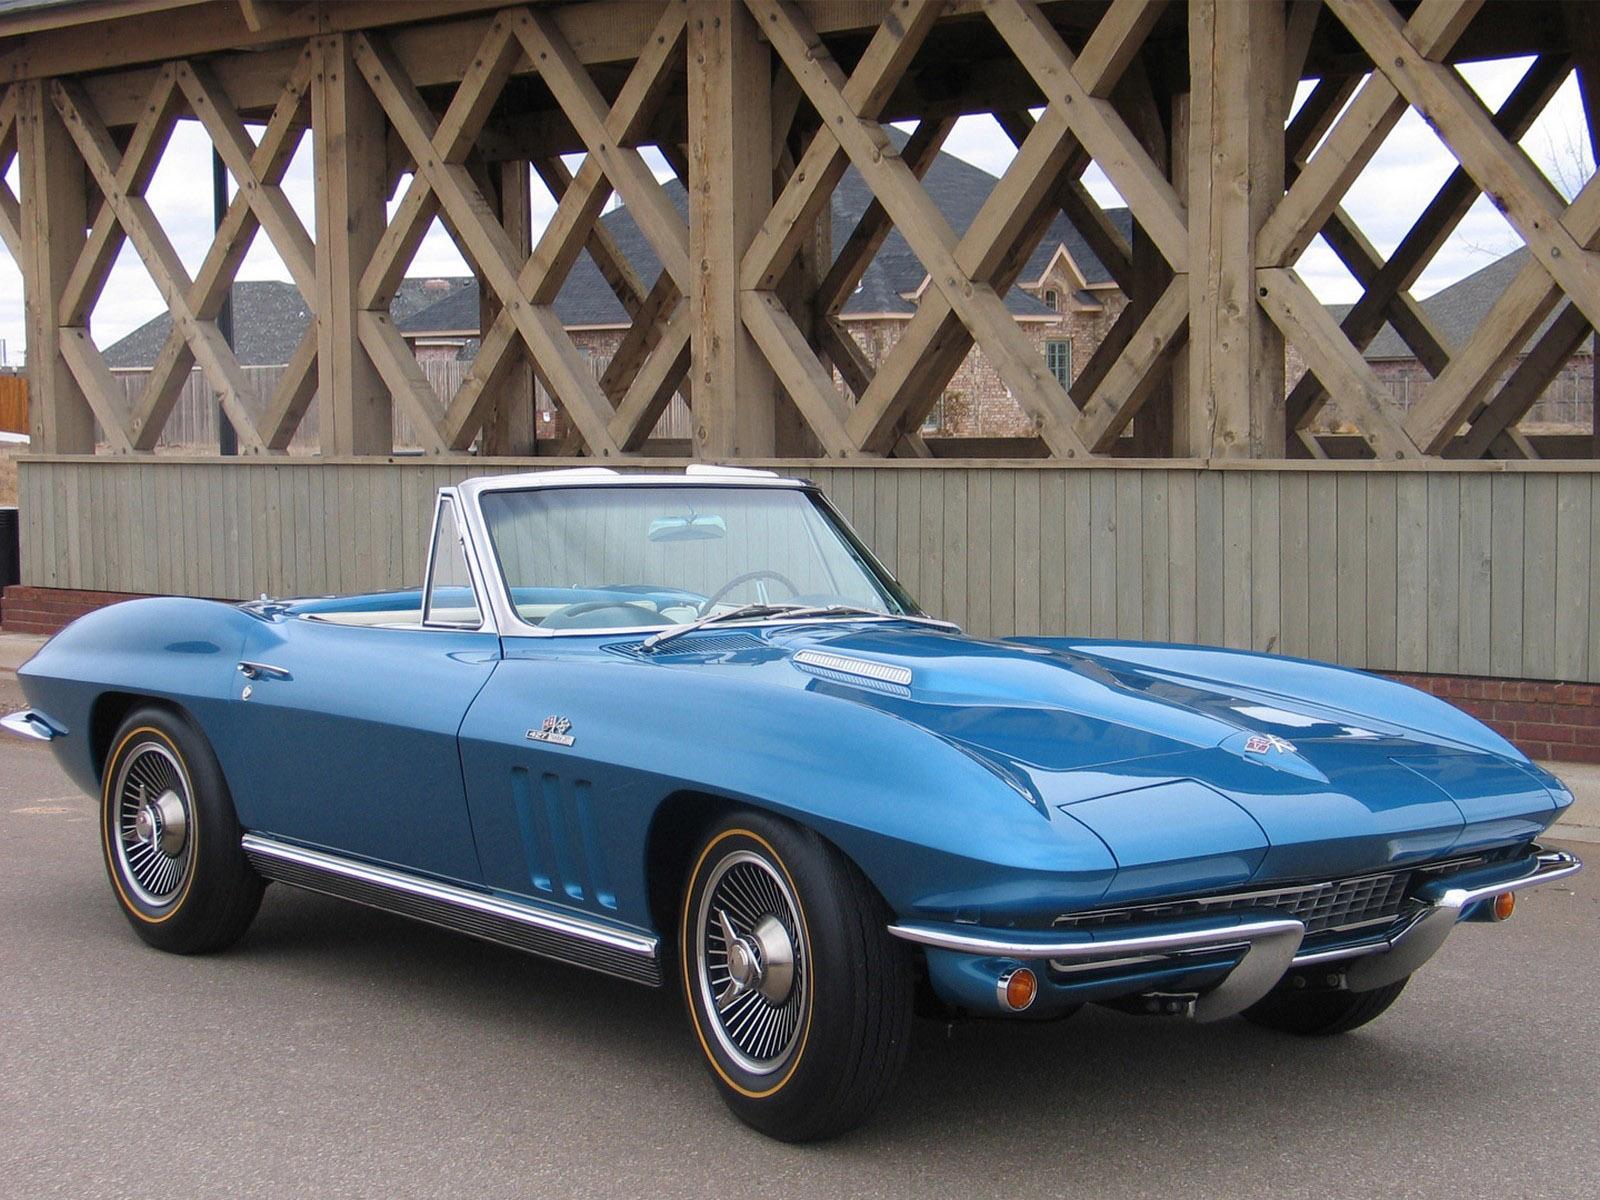 chevrolet corvette c2 sting ray convertible 1965 1966 chevrolet corvette c2 sting ray. Black Bedroom Furniture Sets. Home Design Ideas